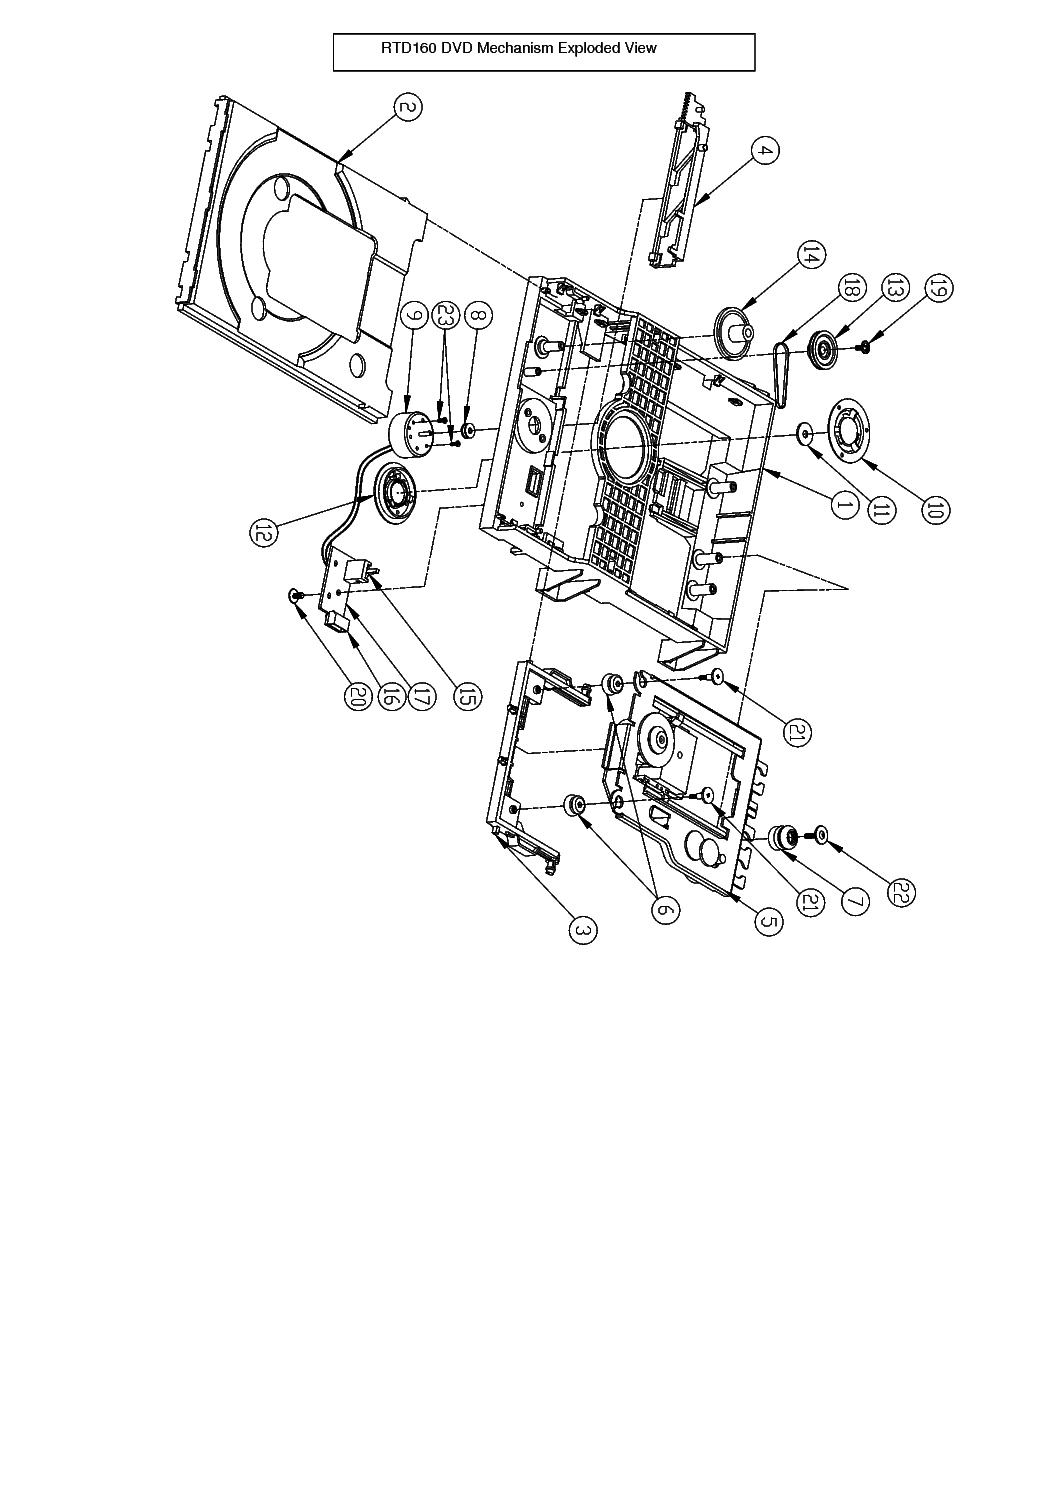 Rca rtd155